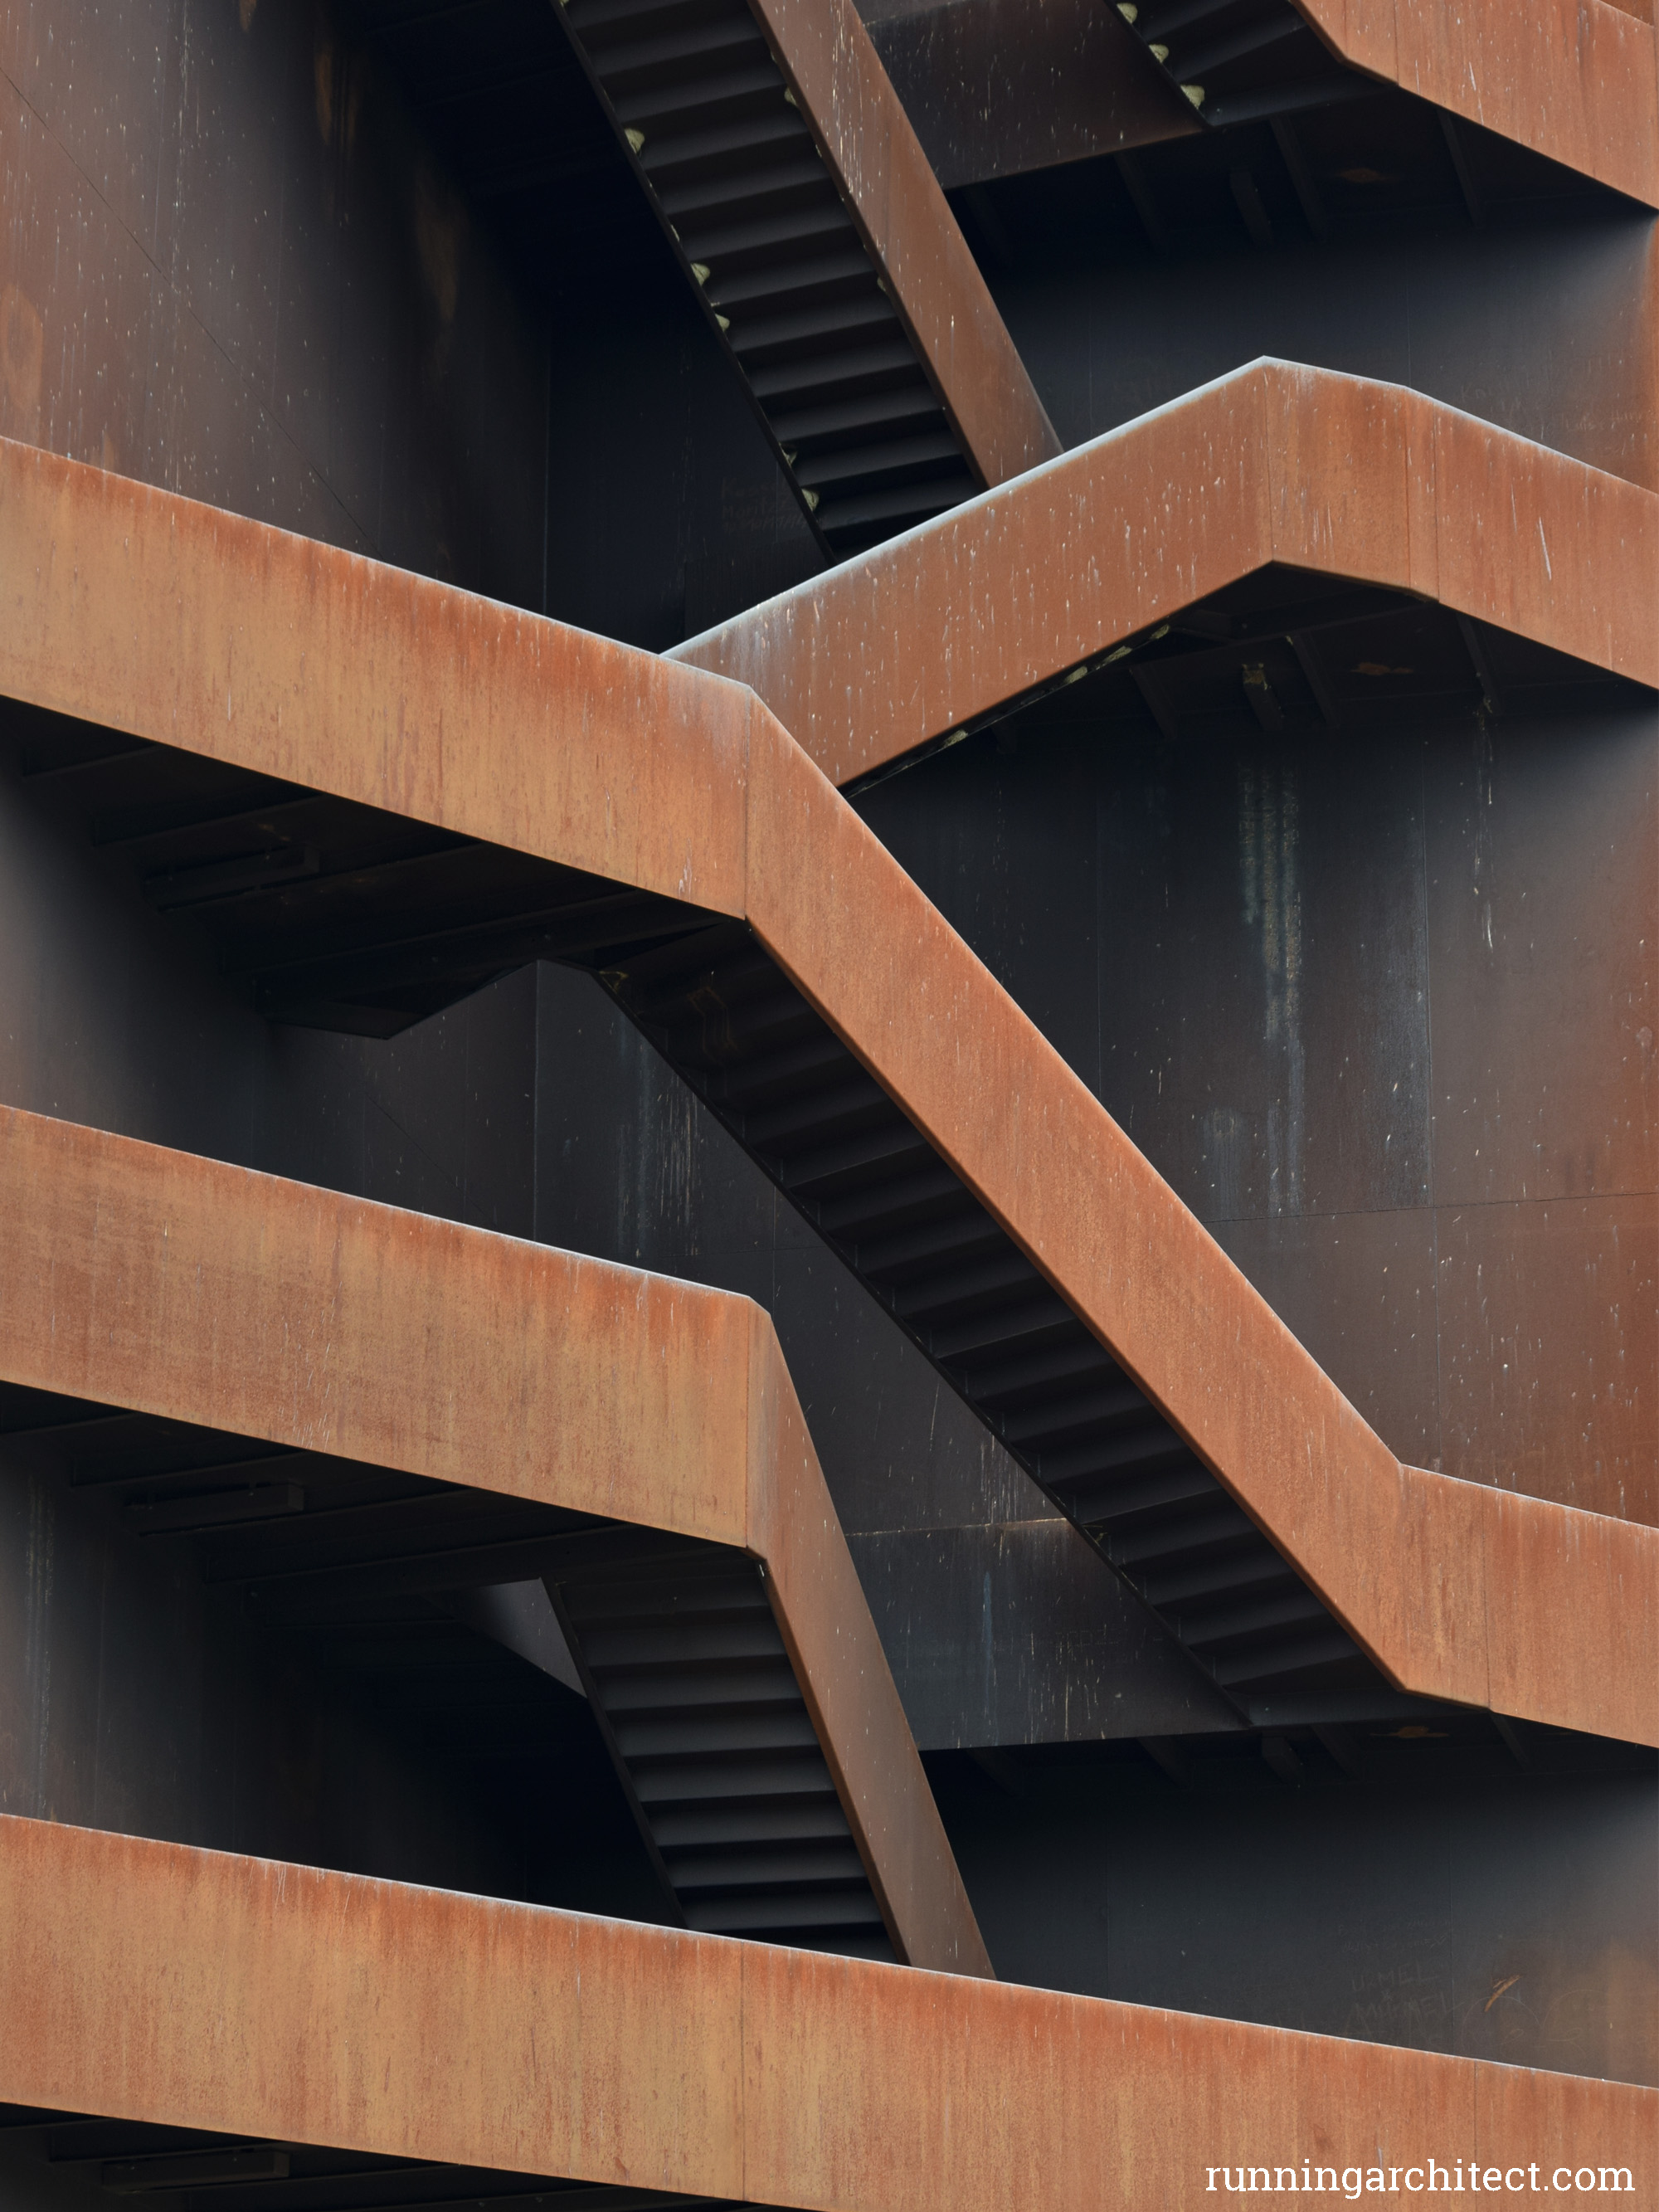 rostiger nagel 02 – running architect.com